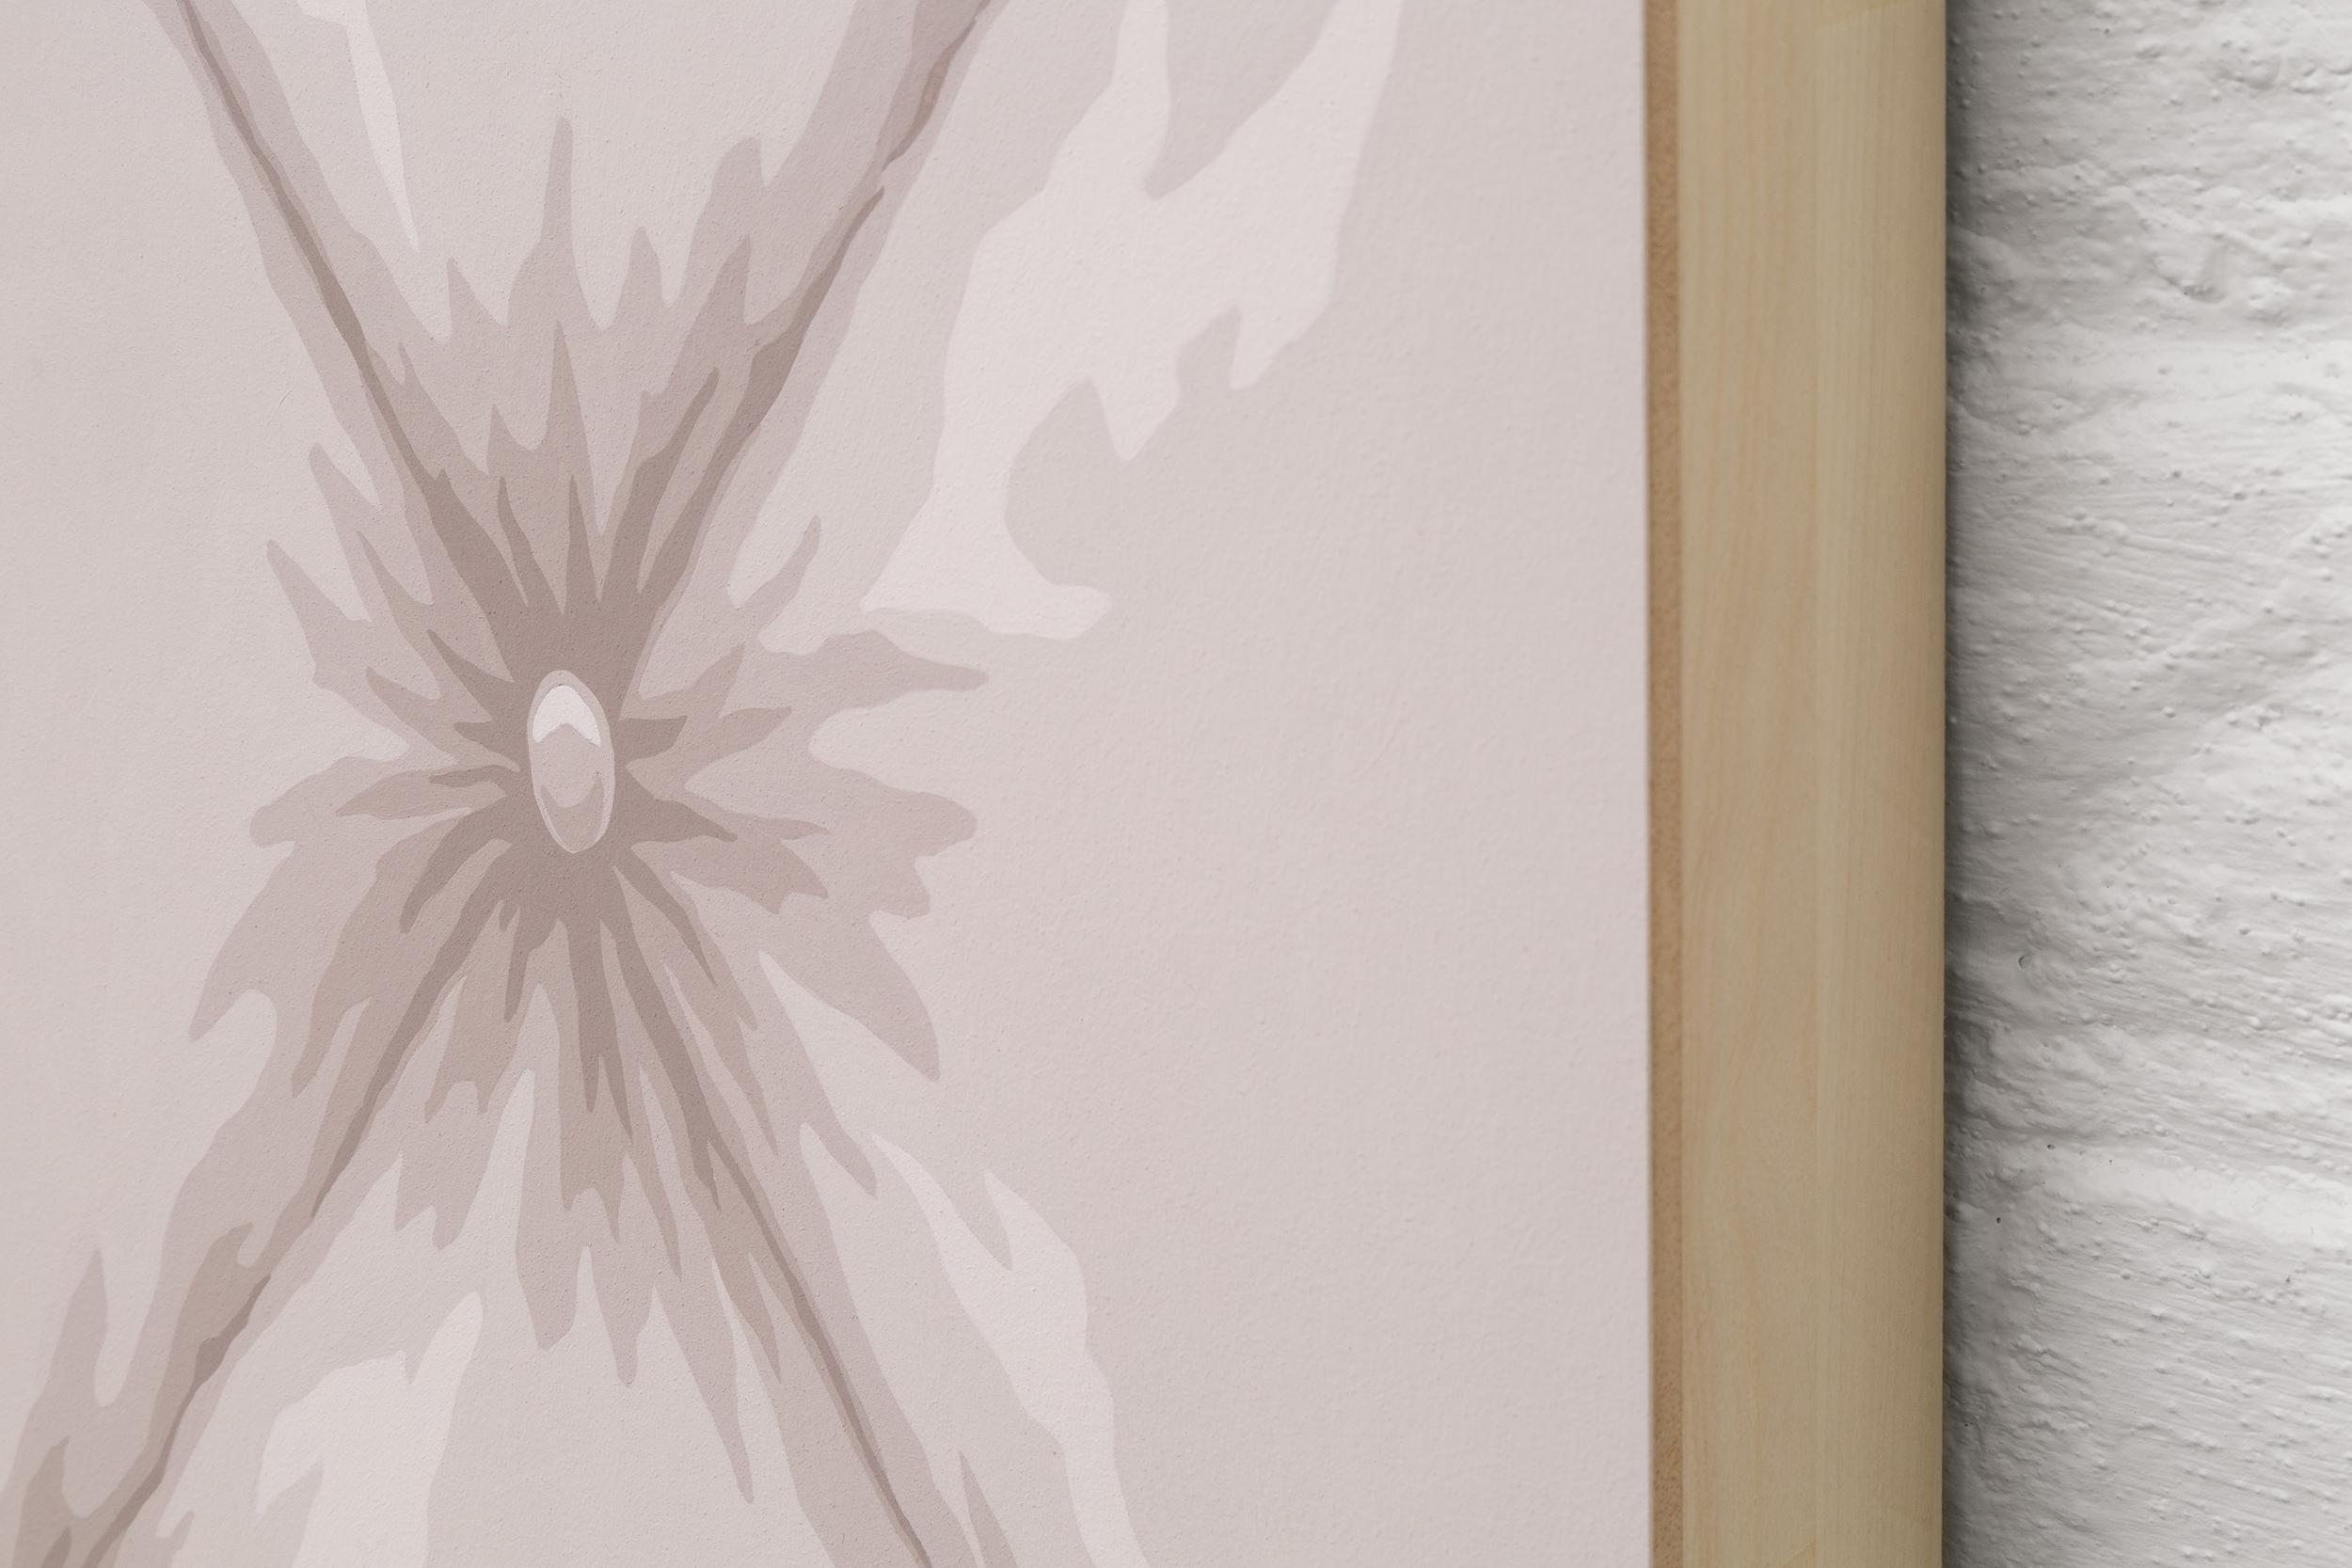 Untitled_Lavender_Bouttoniere_detail.jpg